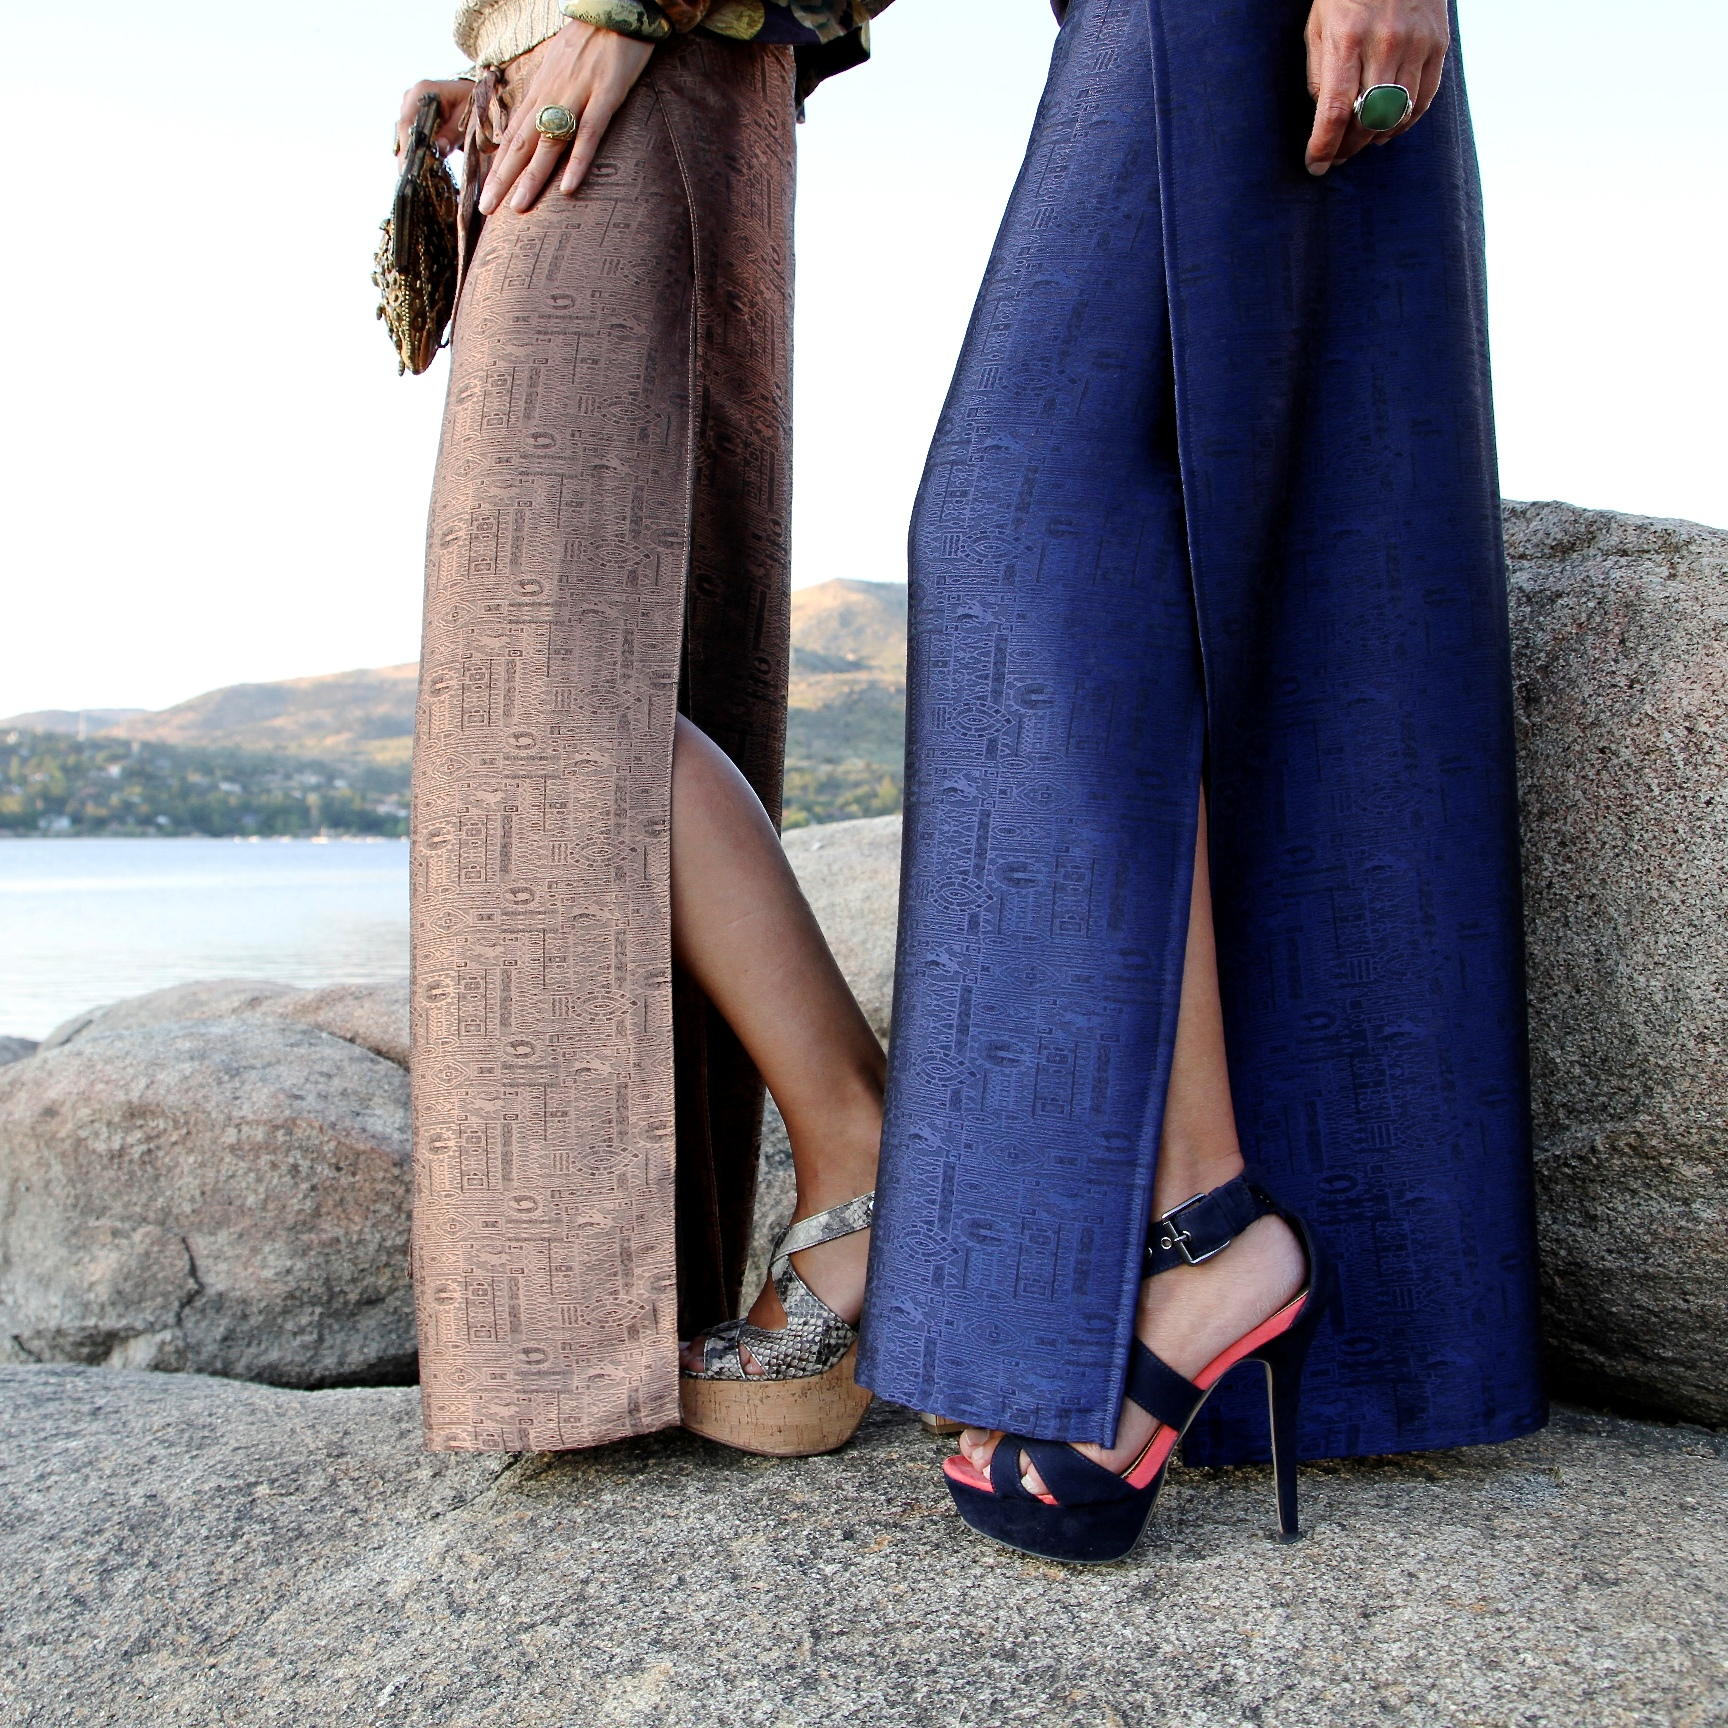 Moda asiática. Pantalones tailandeses